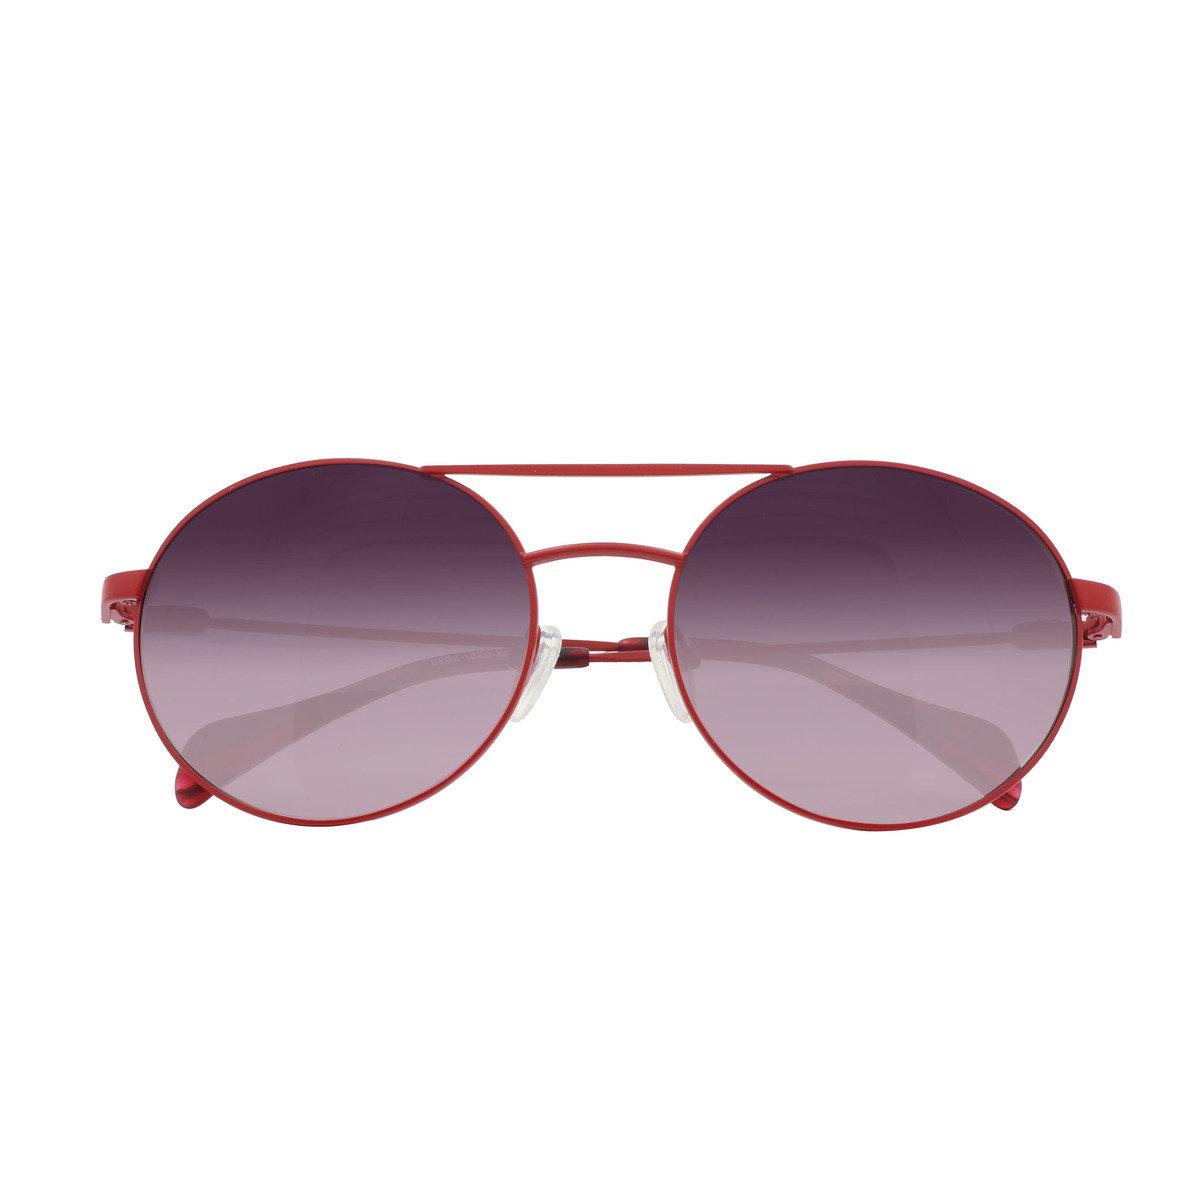 eGG 圓框金屬防UV紅色太陽眼鏡